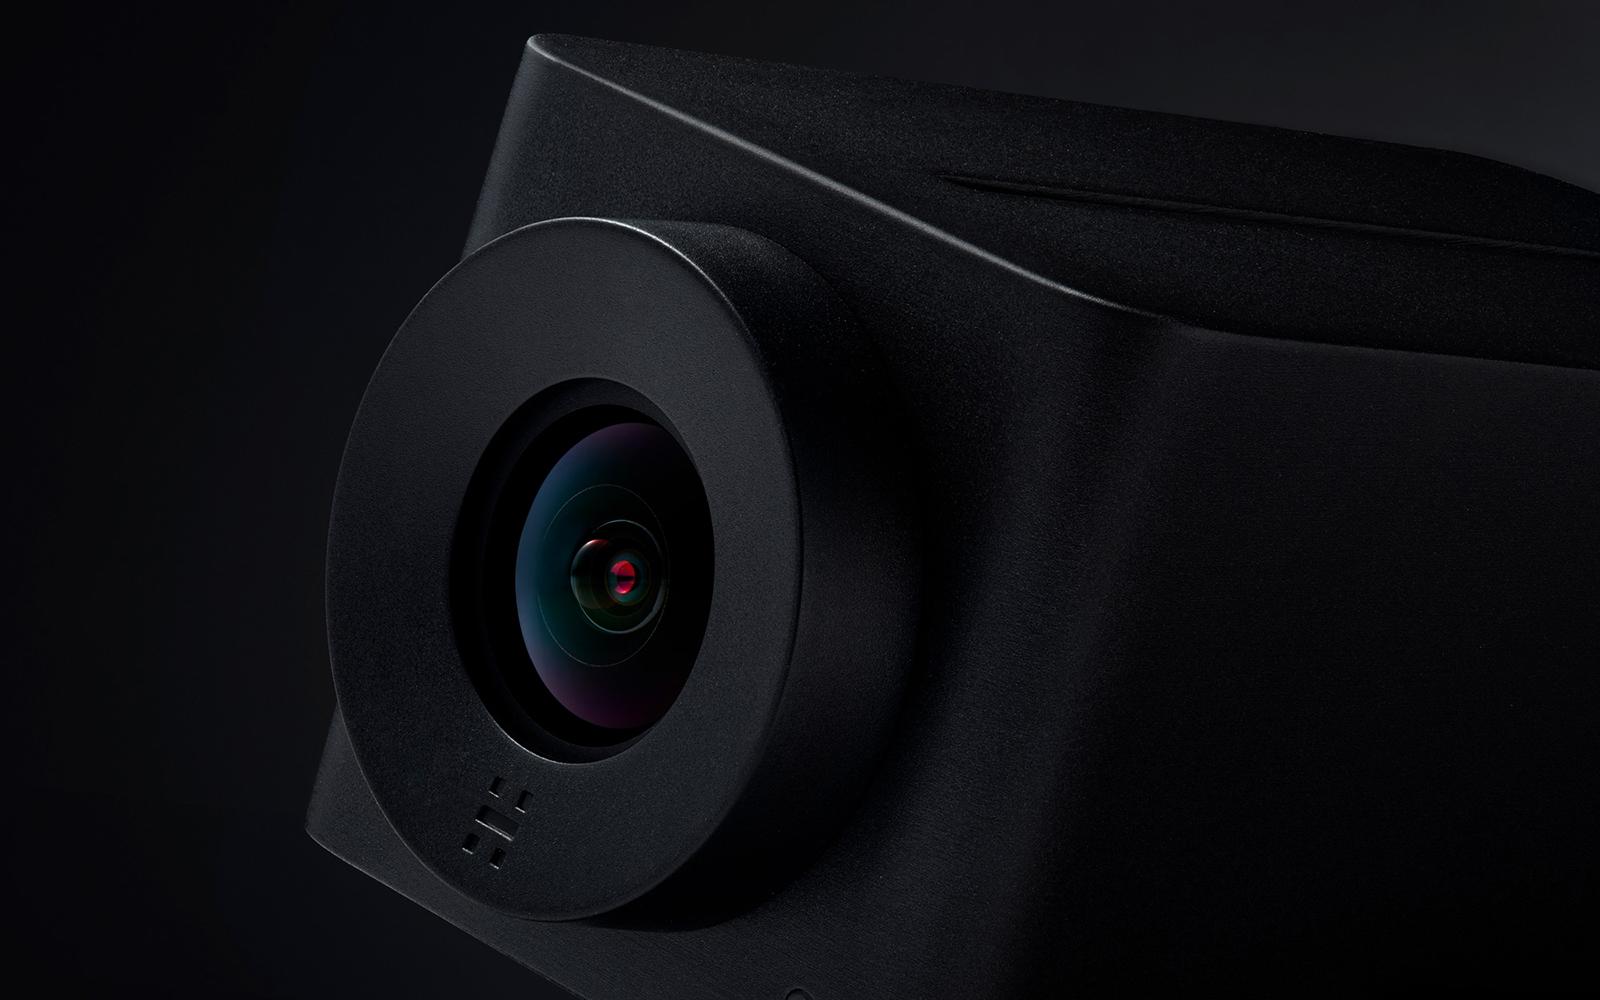 Huddy哈迪集团启用全新的品牌形象与VI系统设计-VI设计06